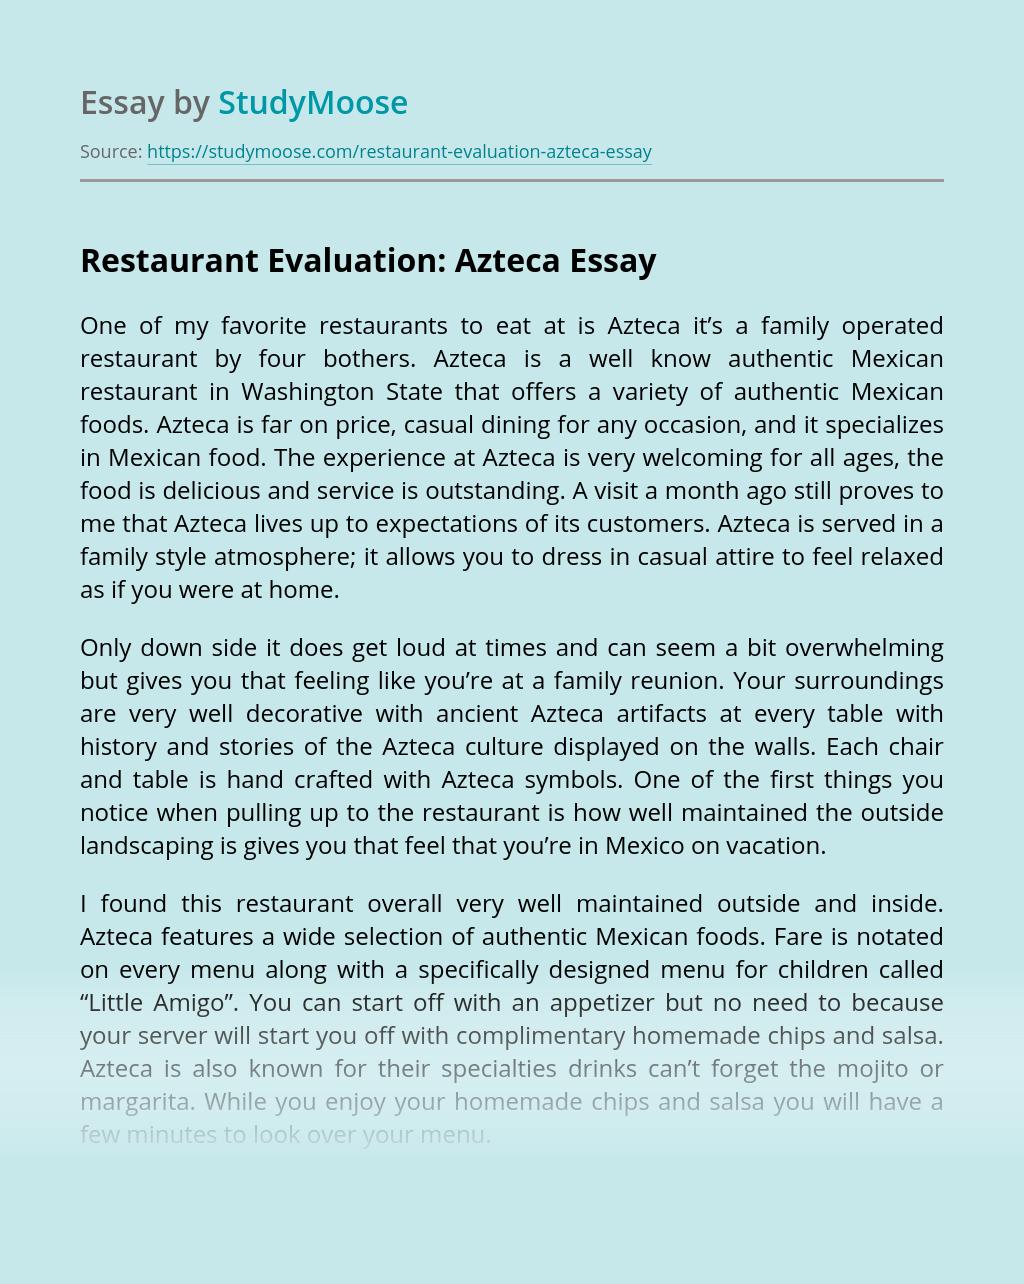 Restaurant Evaluation: Azteca